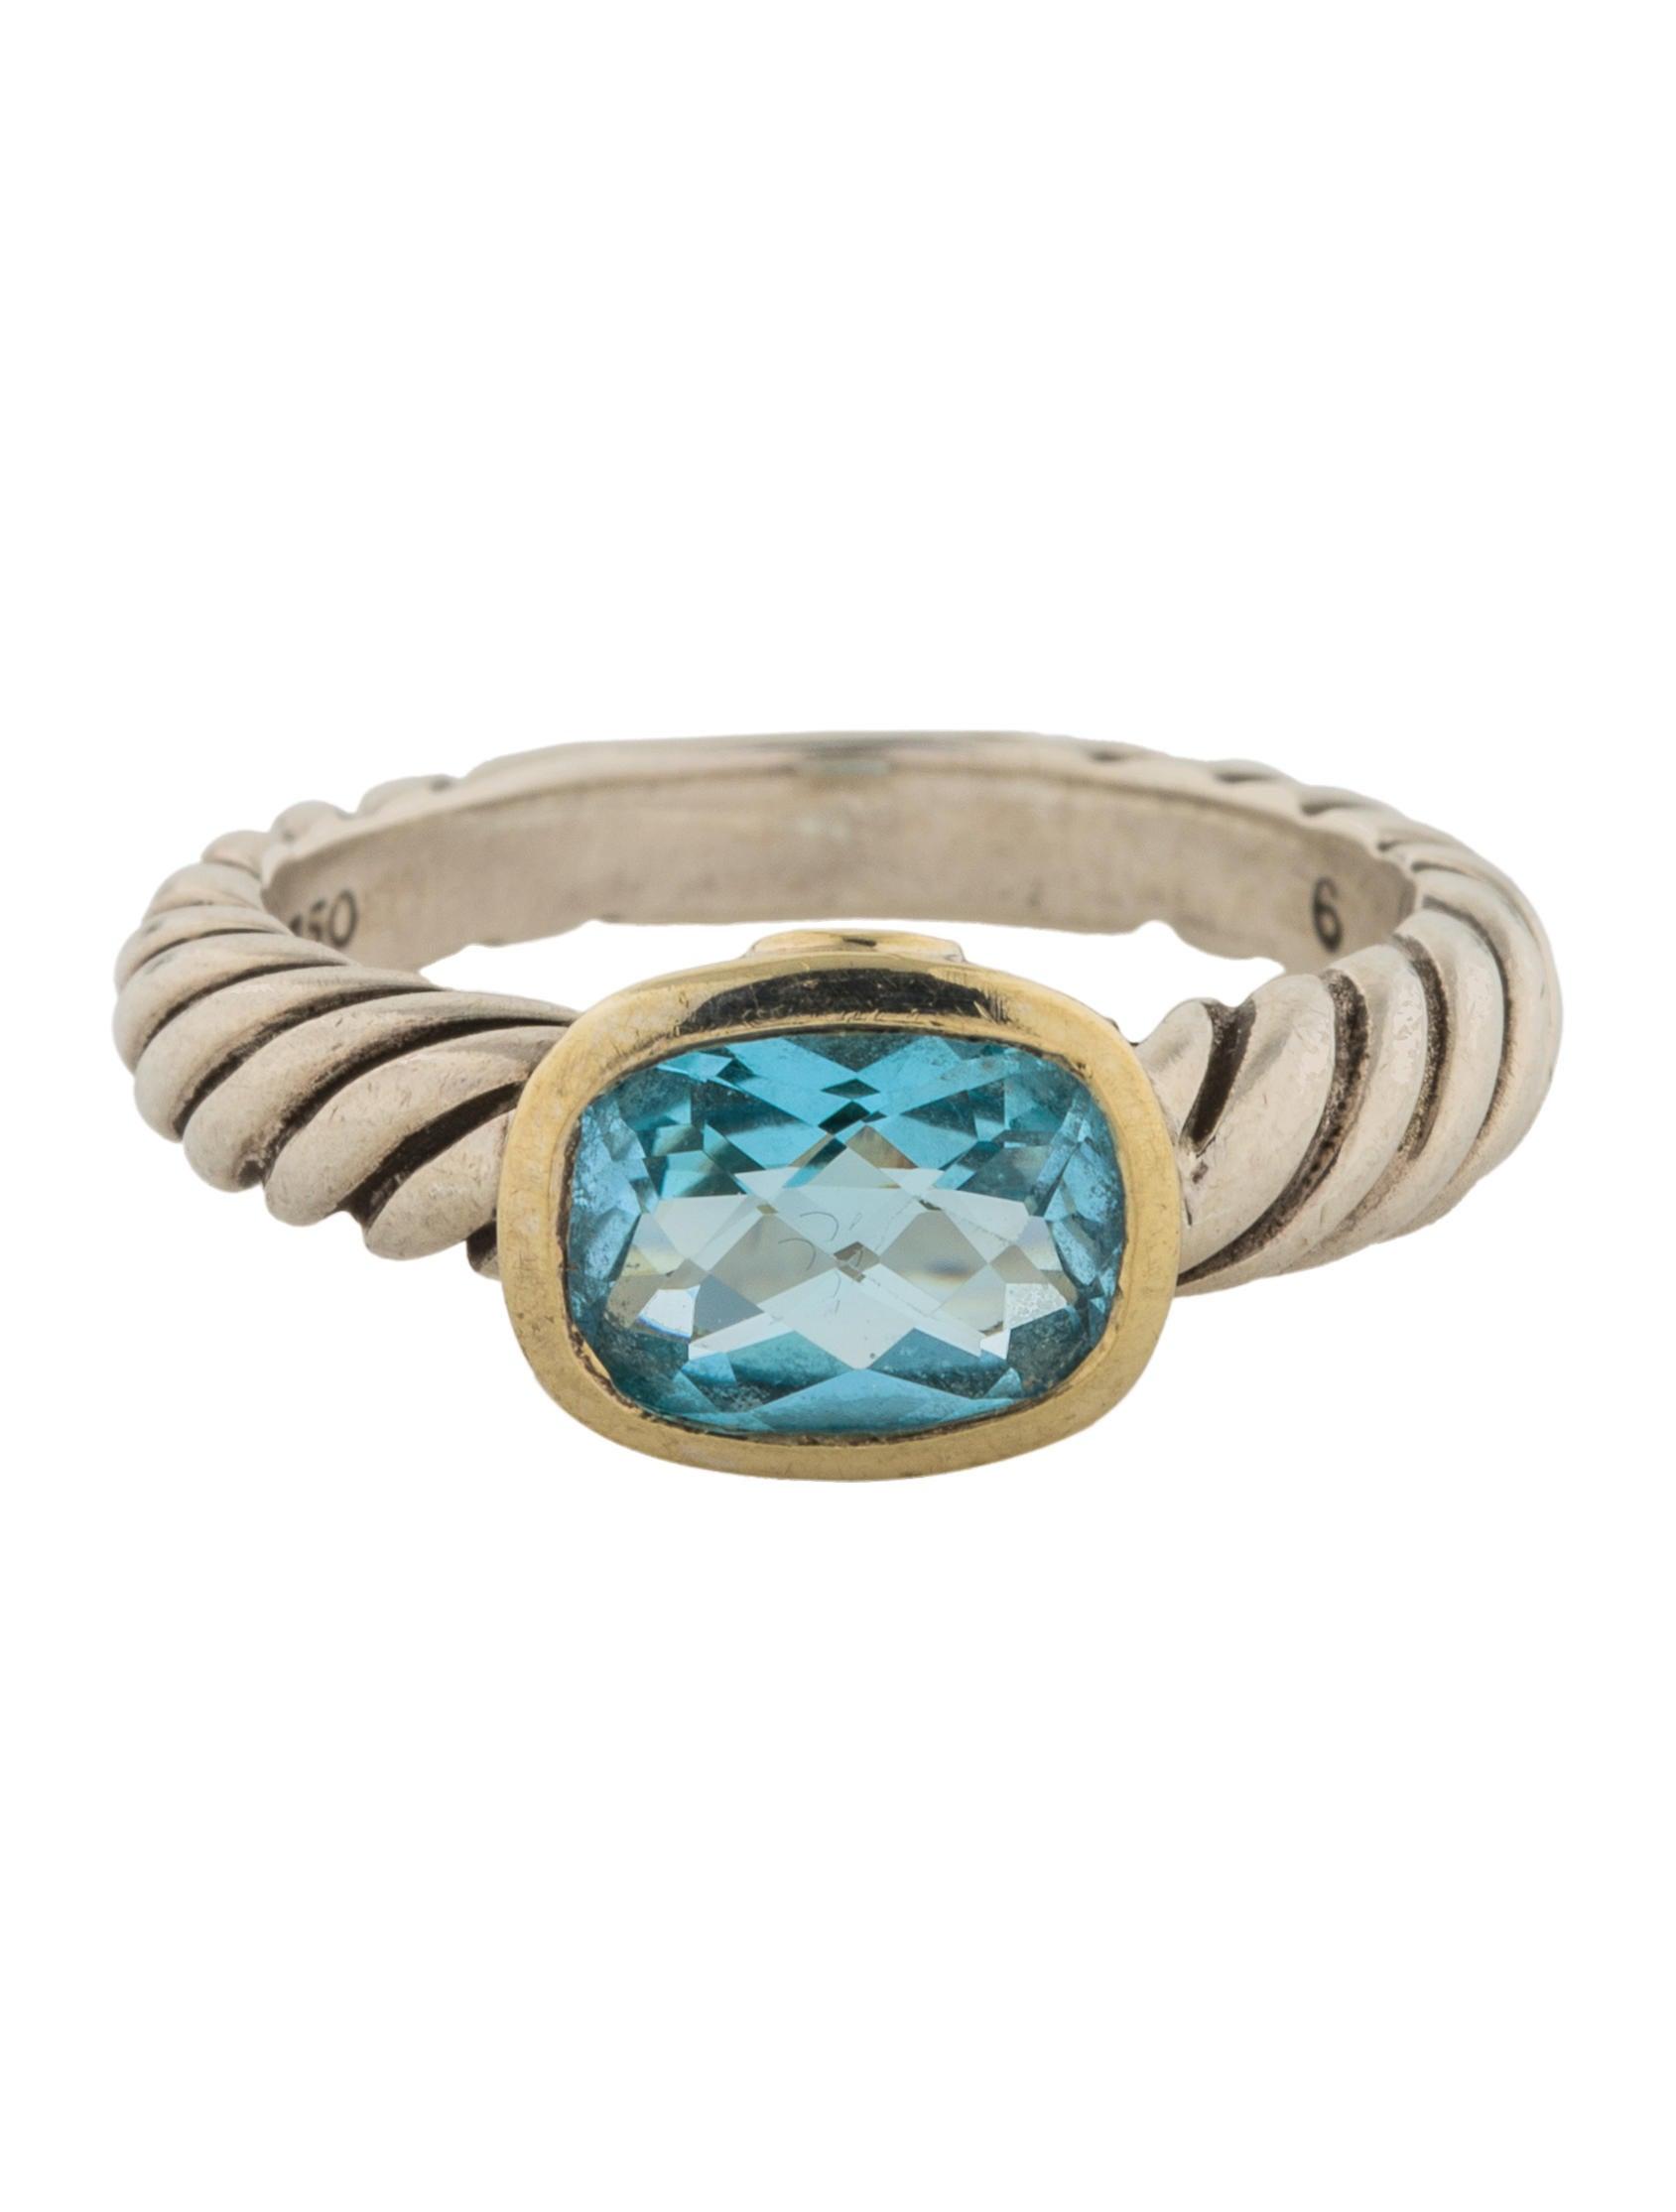 David yurman topaz noblesse ring rings dvy43163 the for David yurman inspired jewelry rings